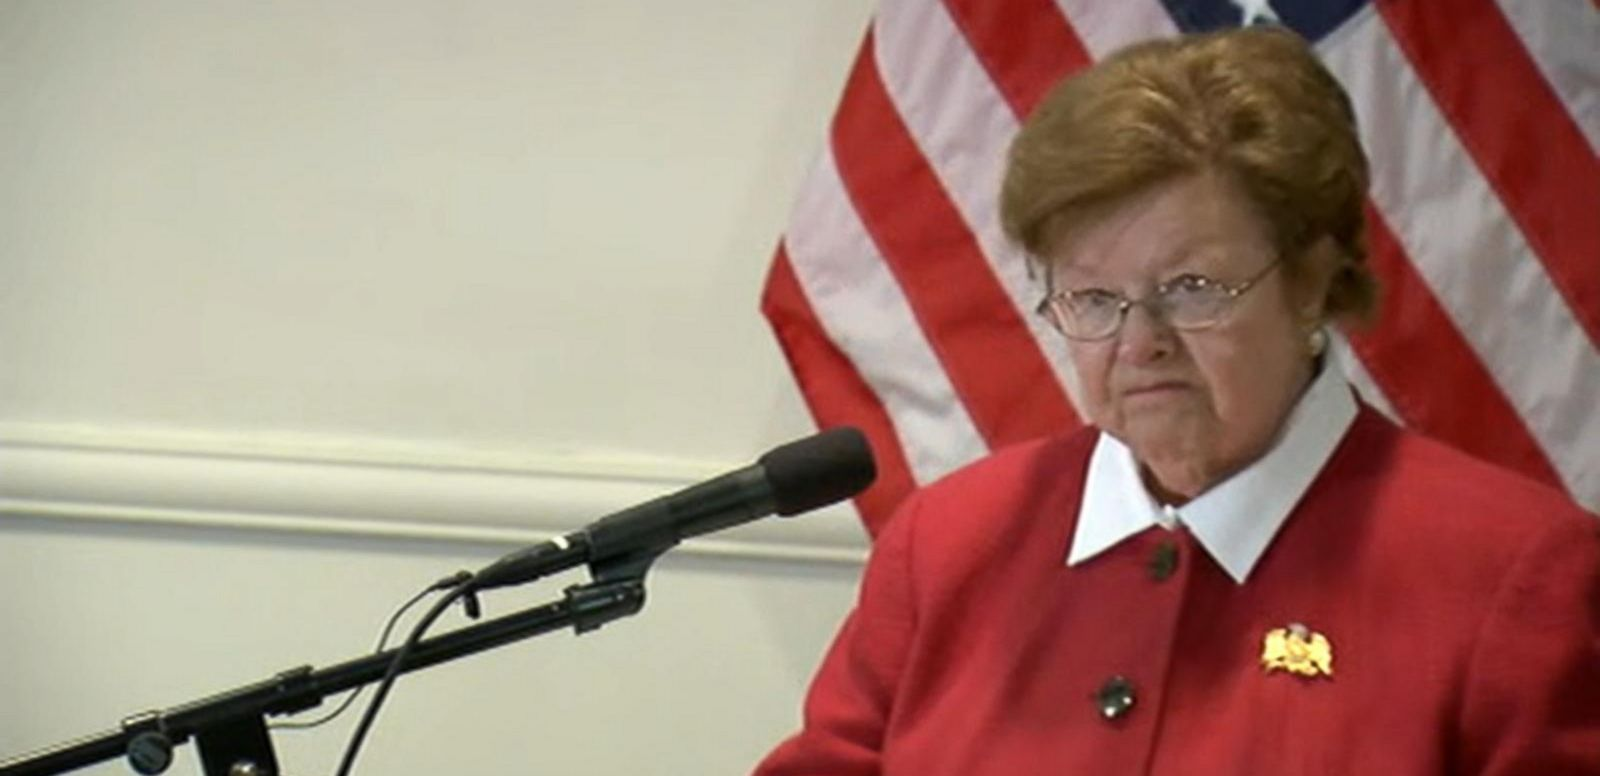 VIDEO: Sen. Barbara Mikulski, Longest-Serving Woman in Congress, Retiring